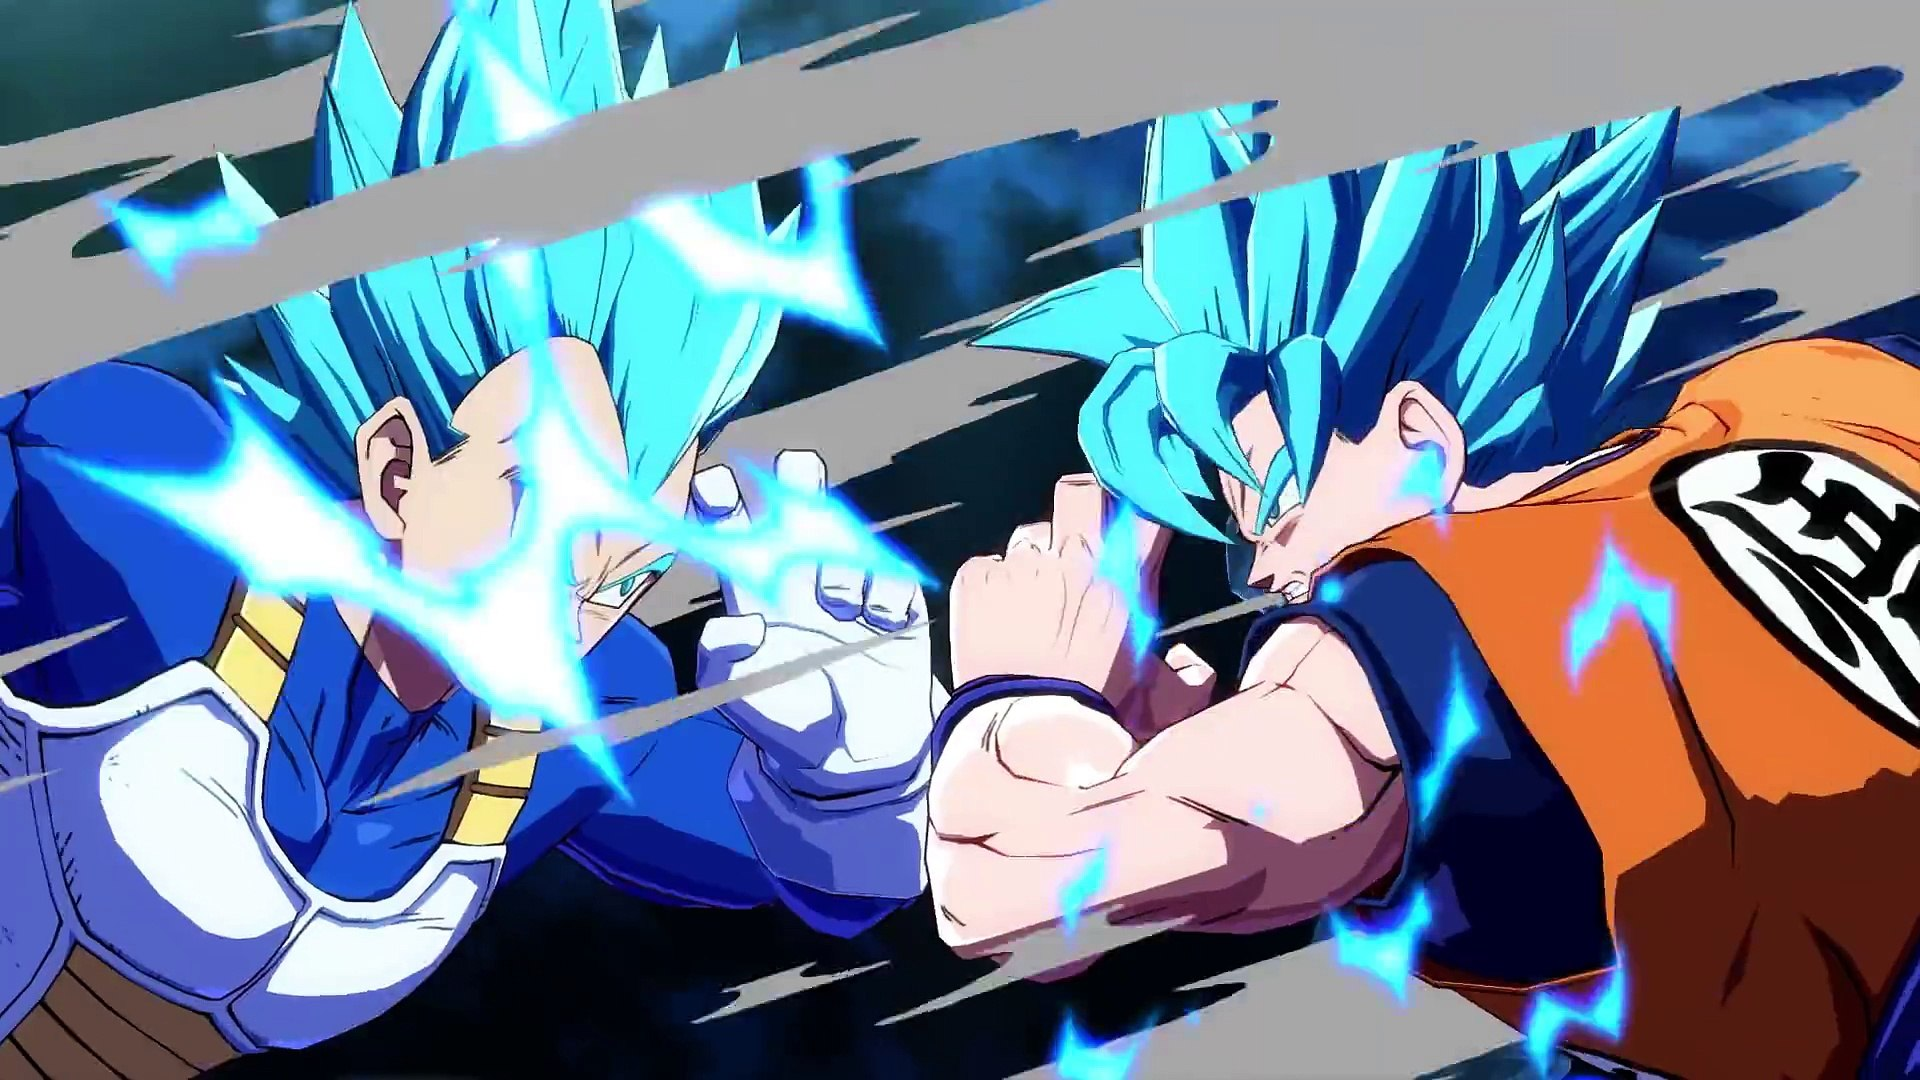 DRAGON BALL FighterZ - Nintendo Switch Trailer